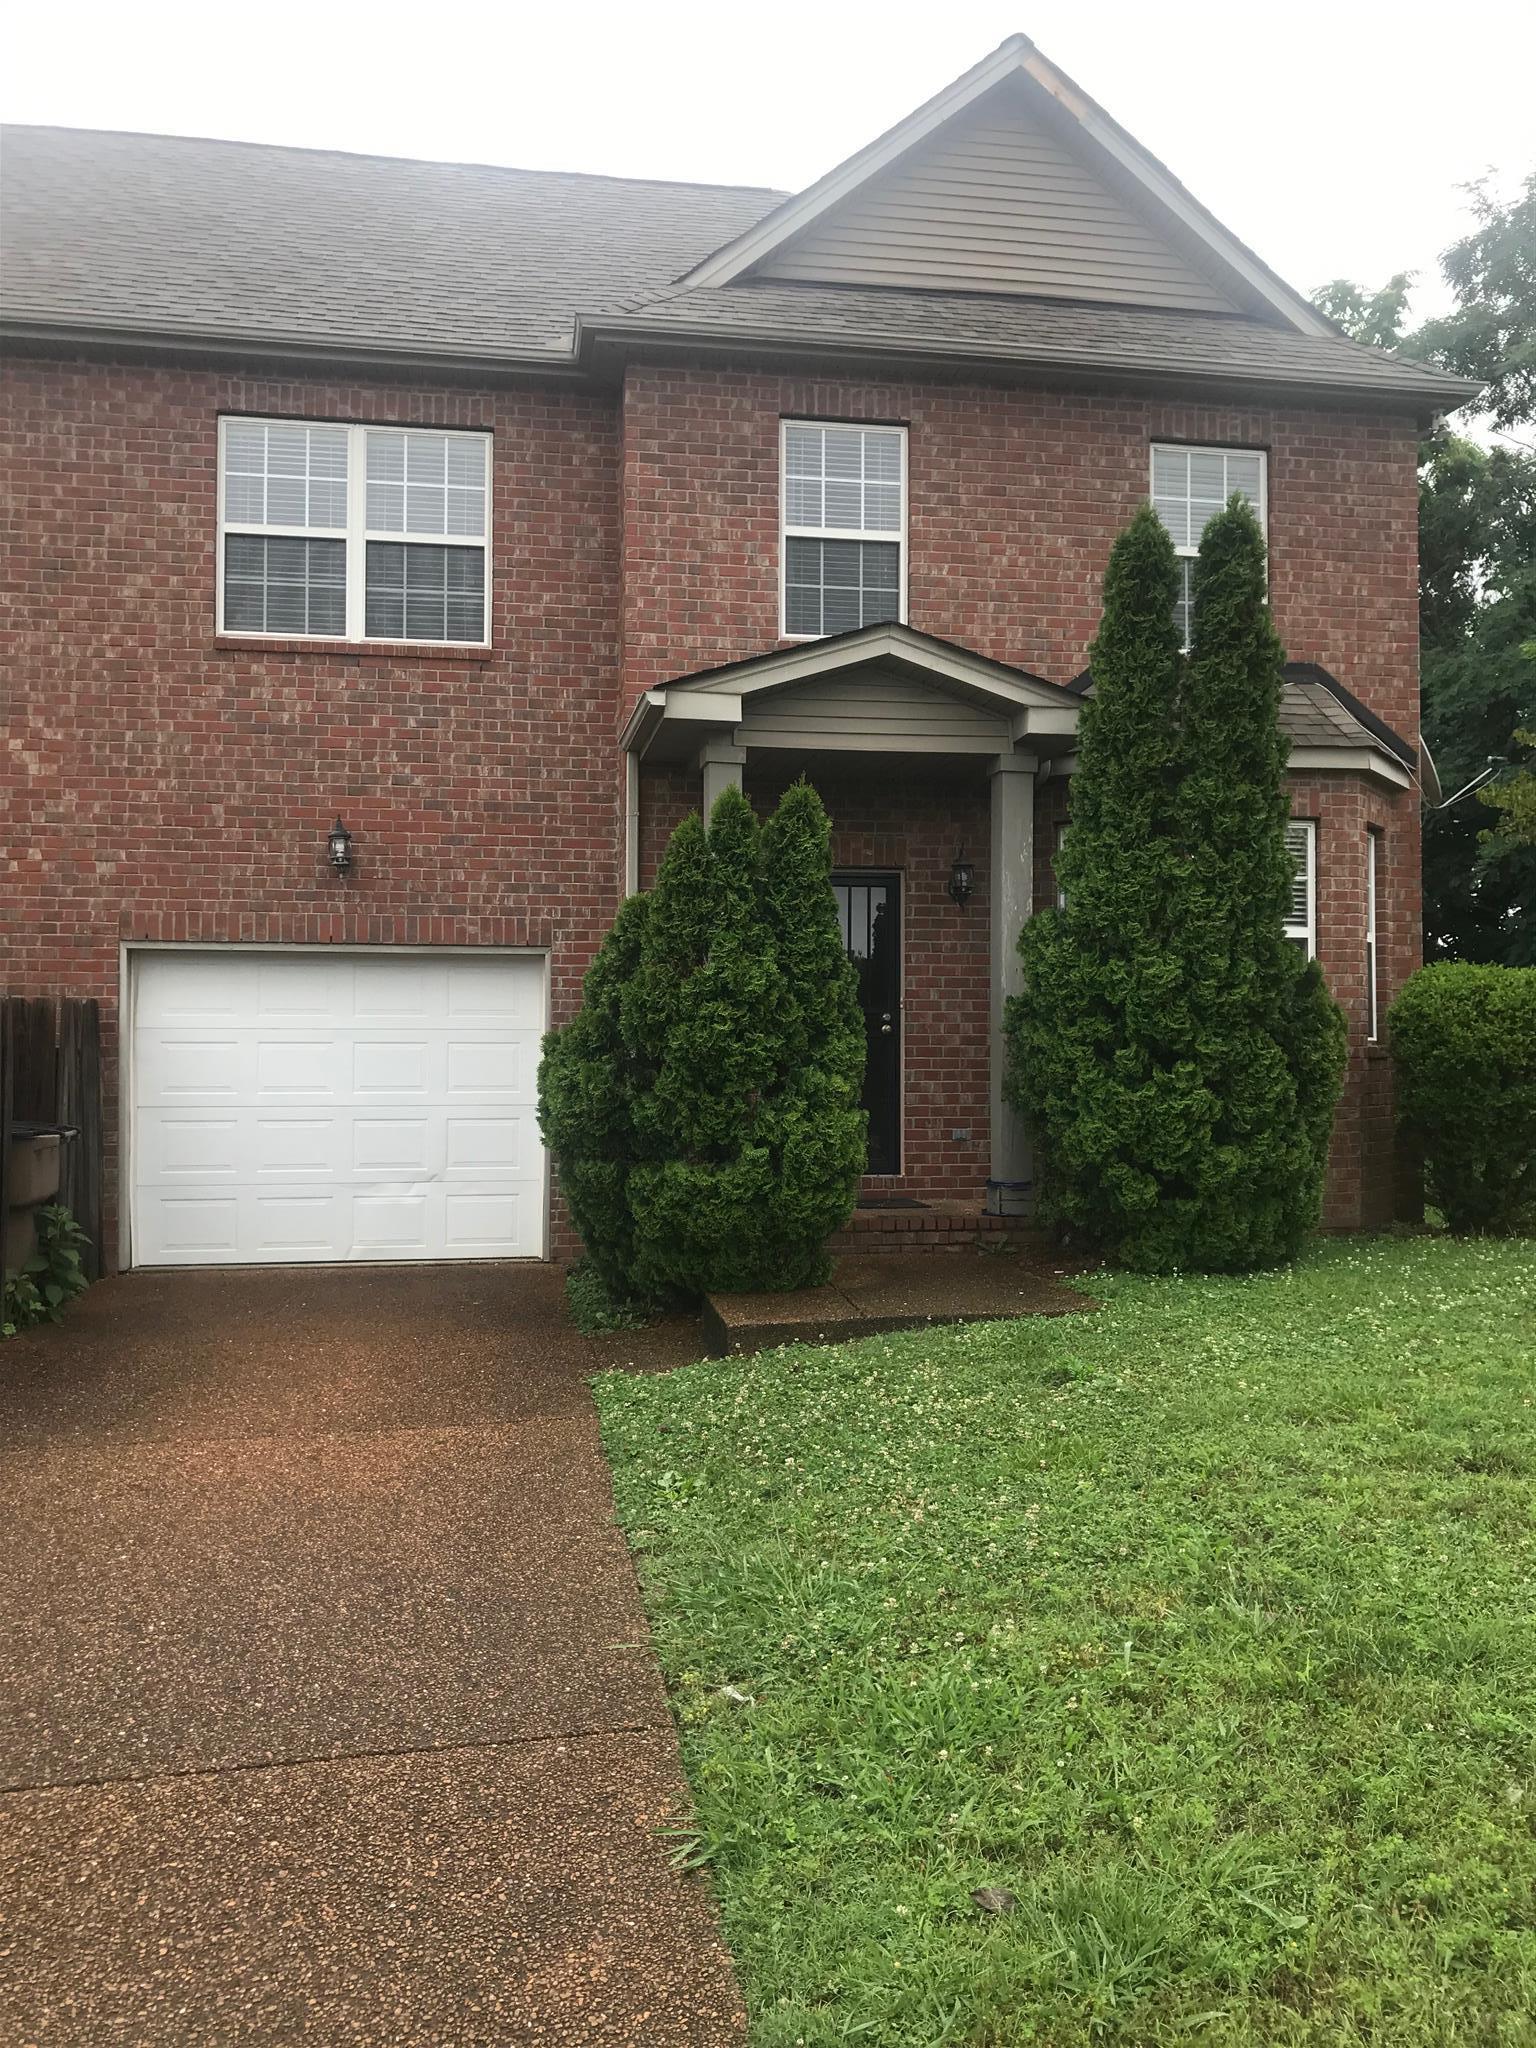 125 Anton Dr, Nashville, TN 37211 - Nashville, TN real estate listing